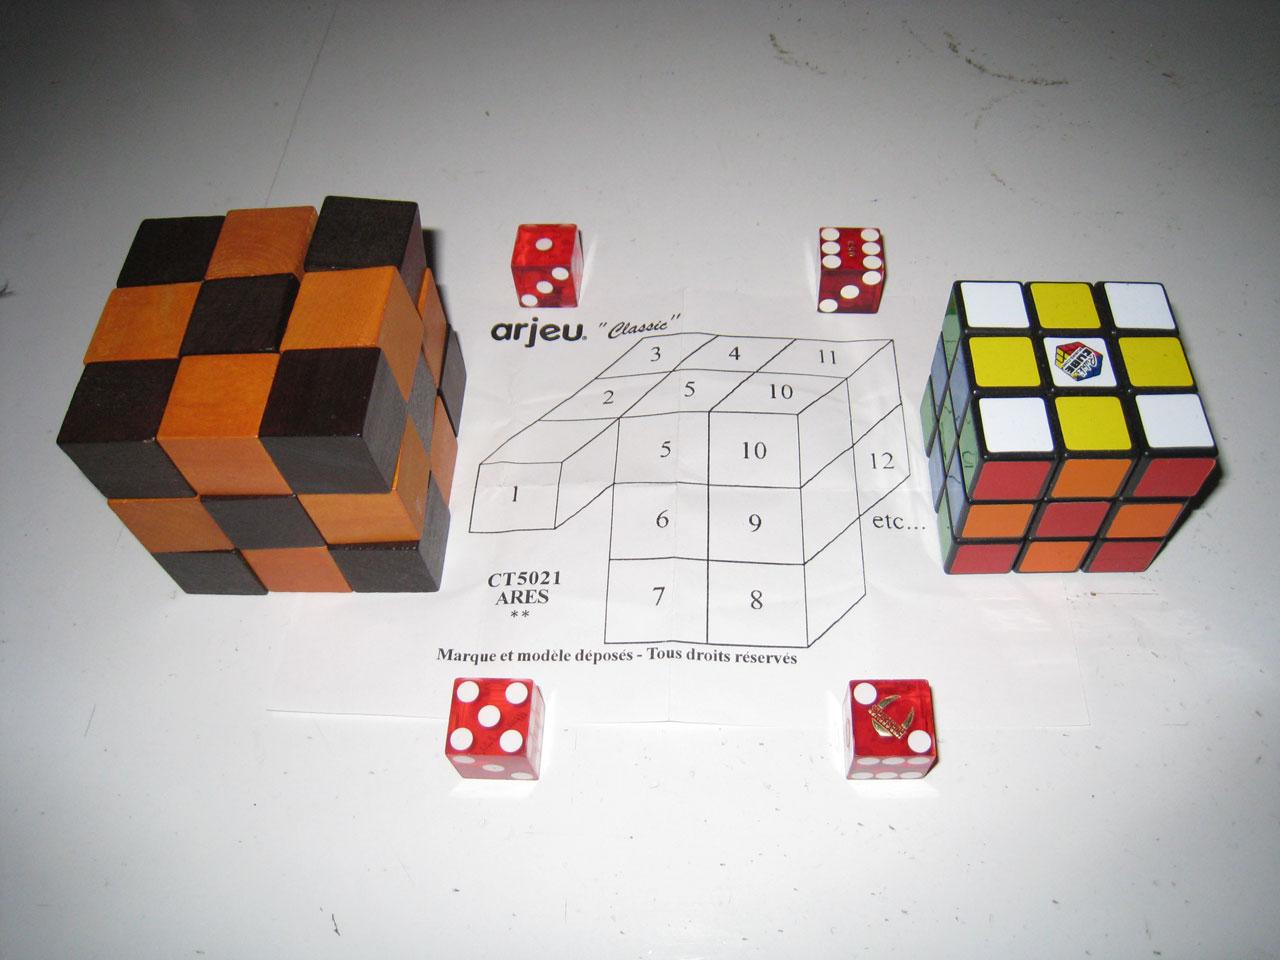 ares ct5021 la solution du rubik 39 s cube en bois. Black Bedroom Furniture Sets. Home Design Ideas